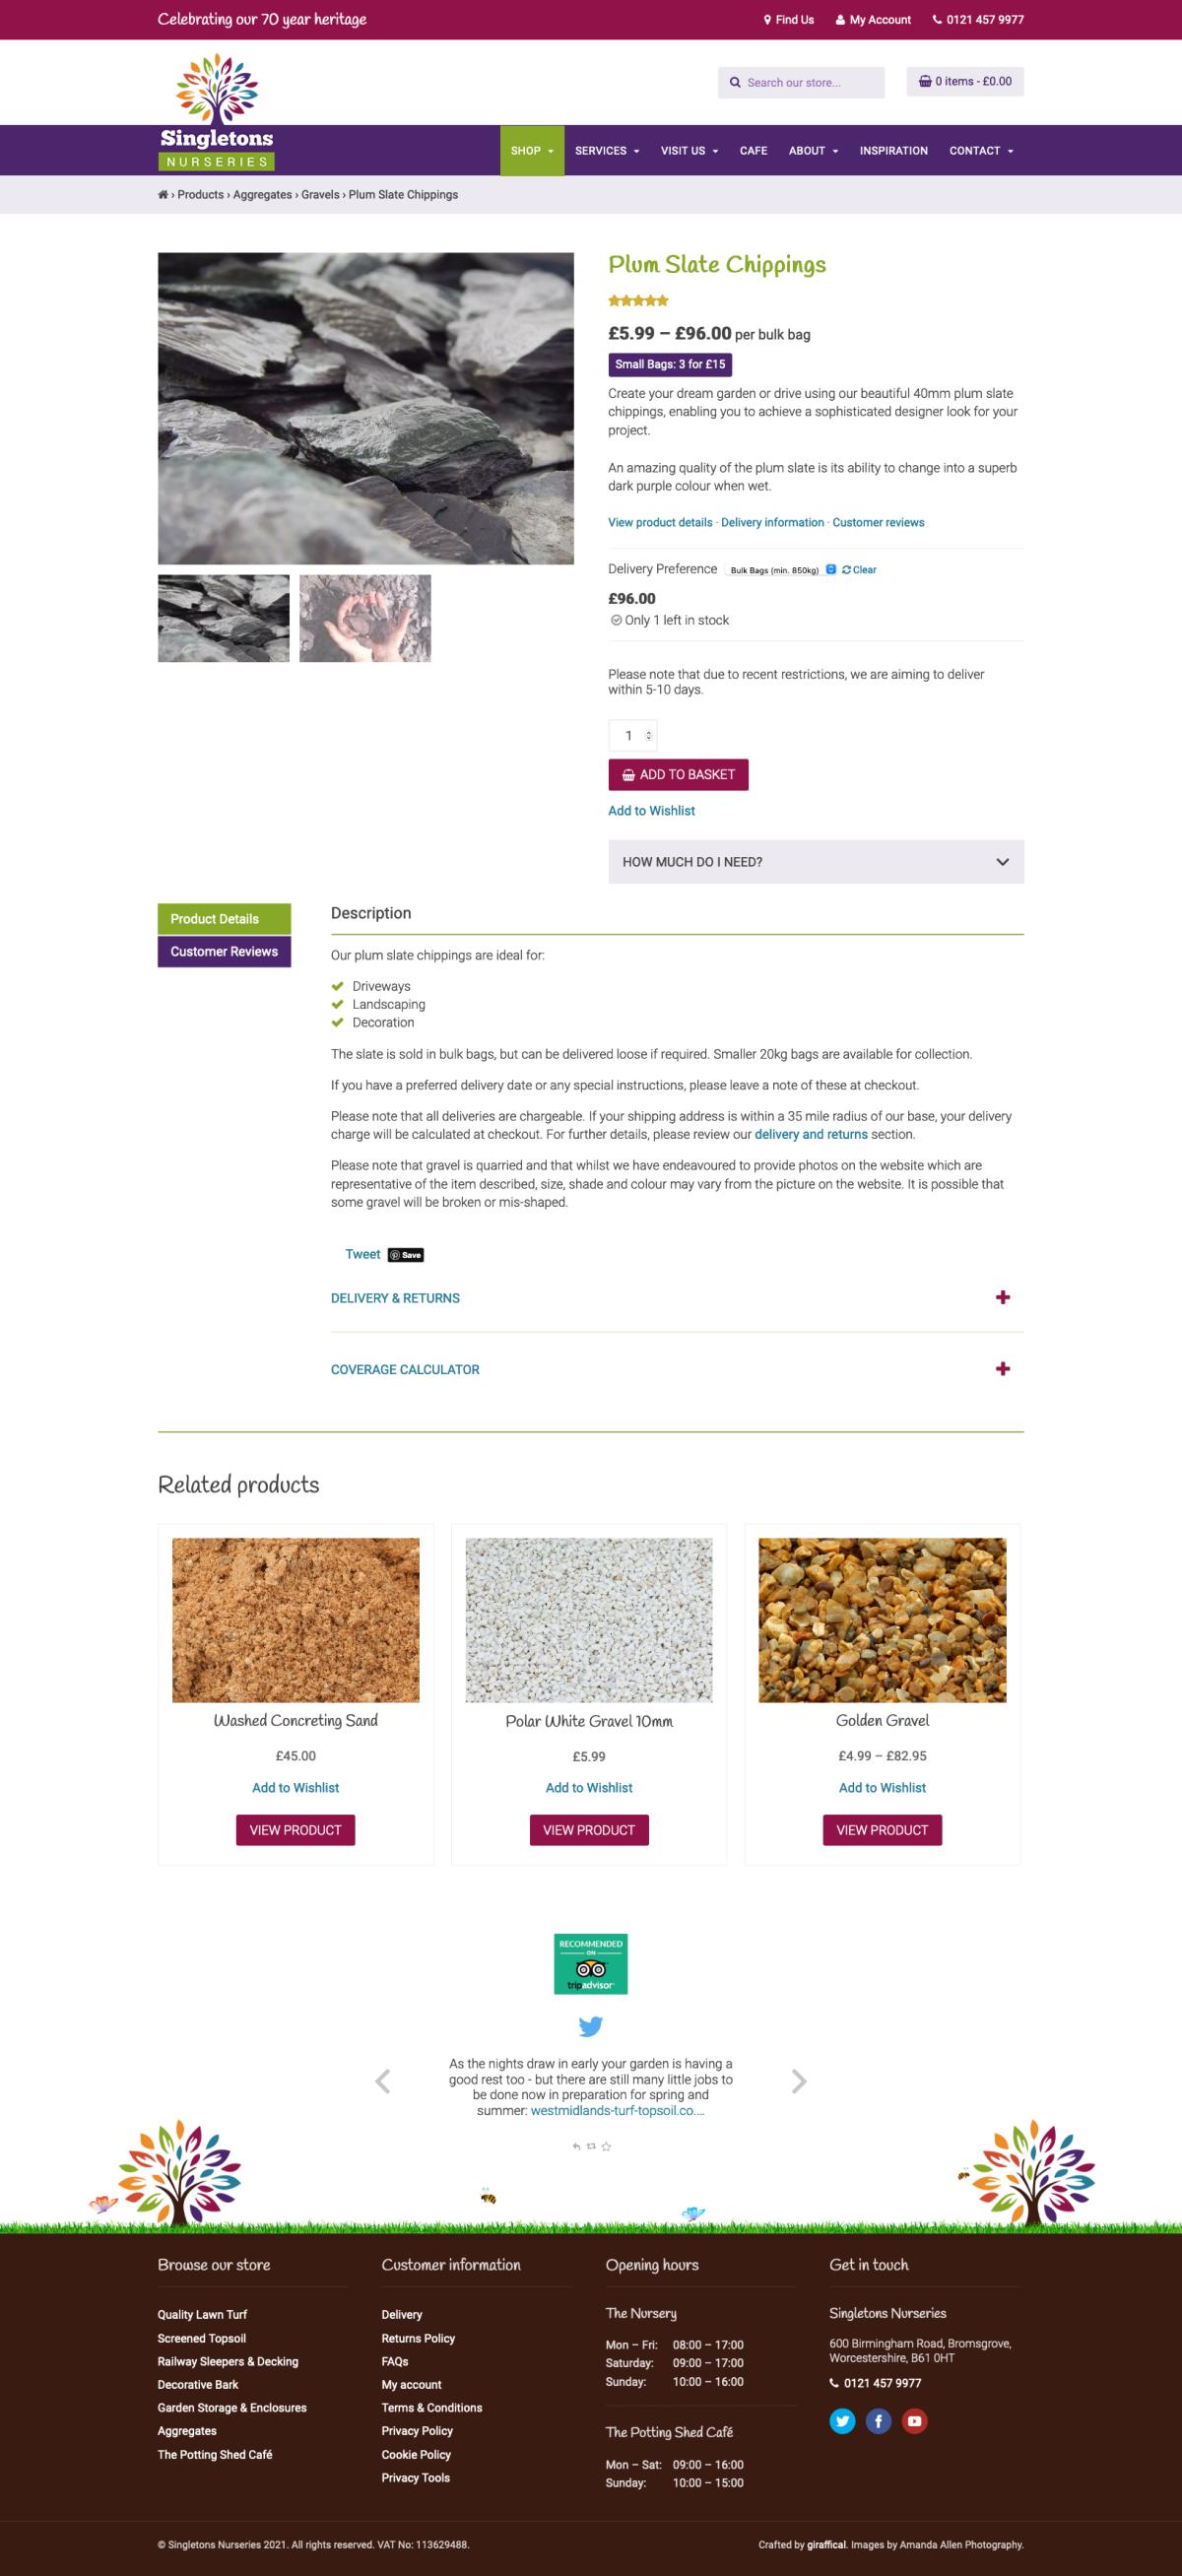 Garden Centre Website Design - Singletons Nurseries - Product Page